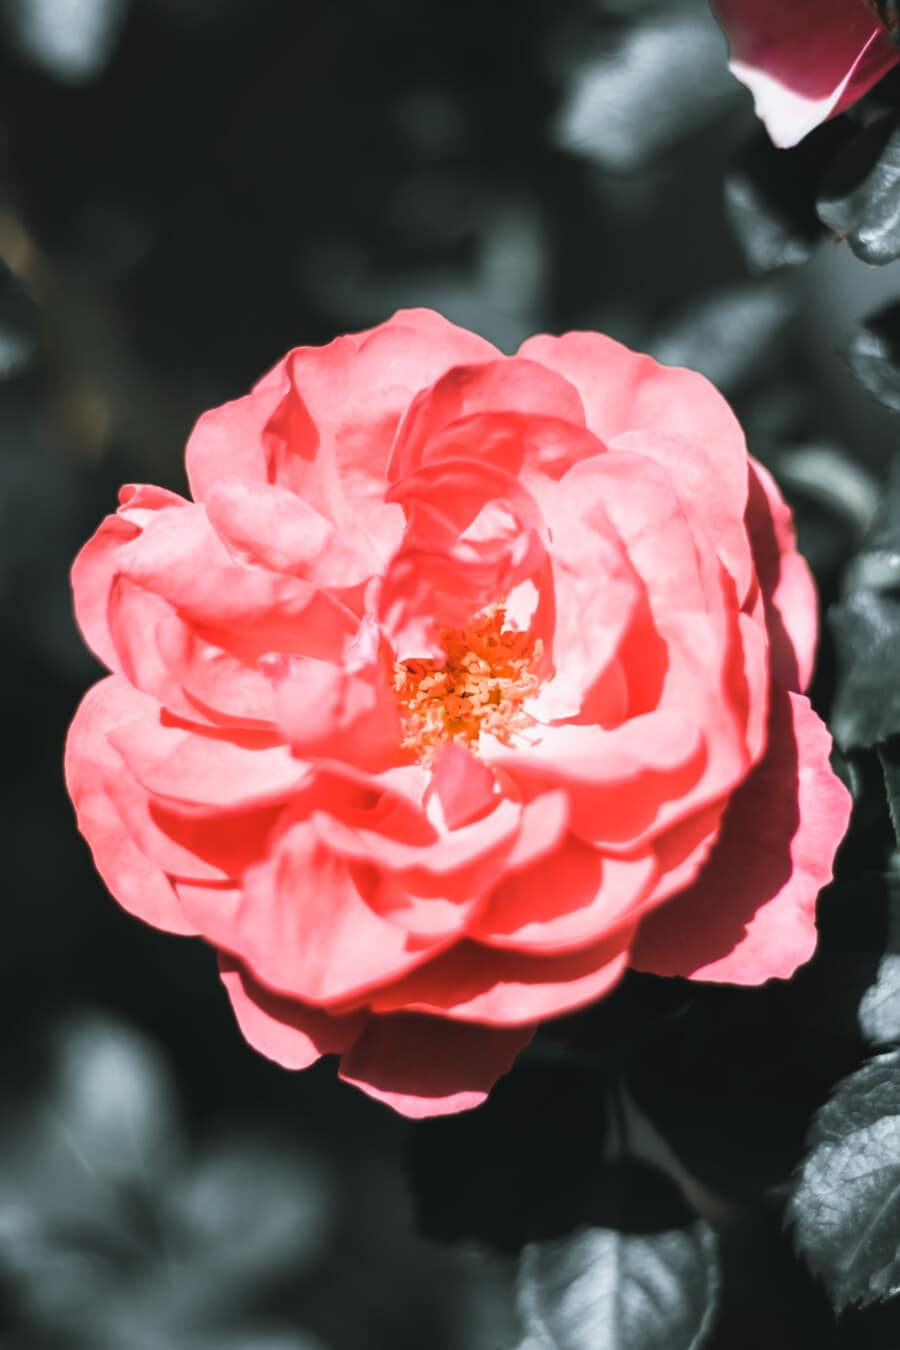 Rose, fleur, rosâtre, arbuste, feuille, nature, rose, jardin, plante, pétale